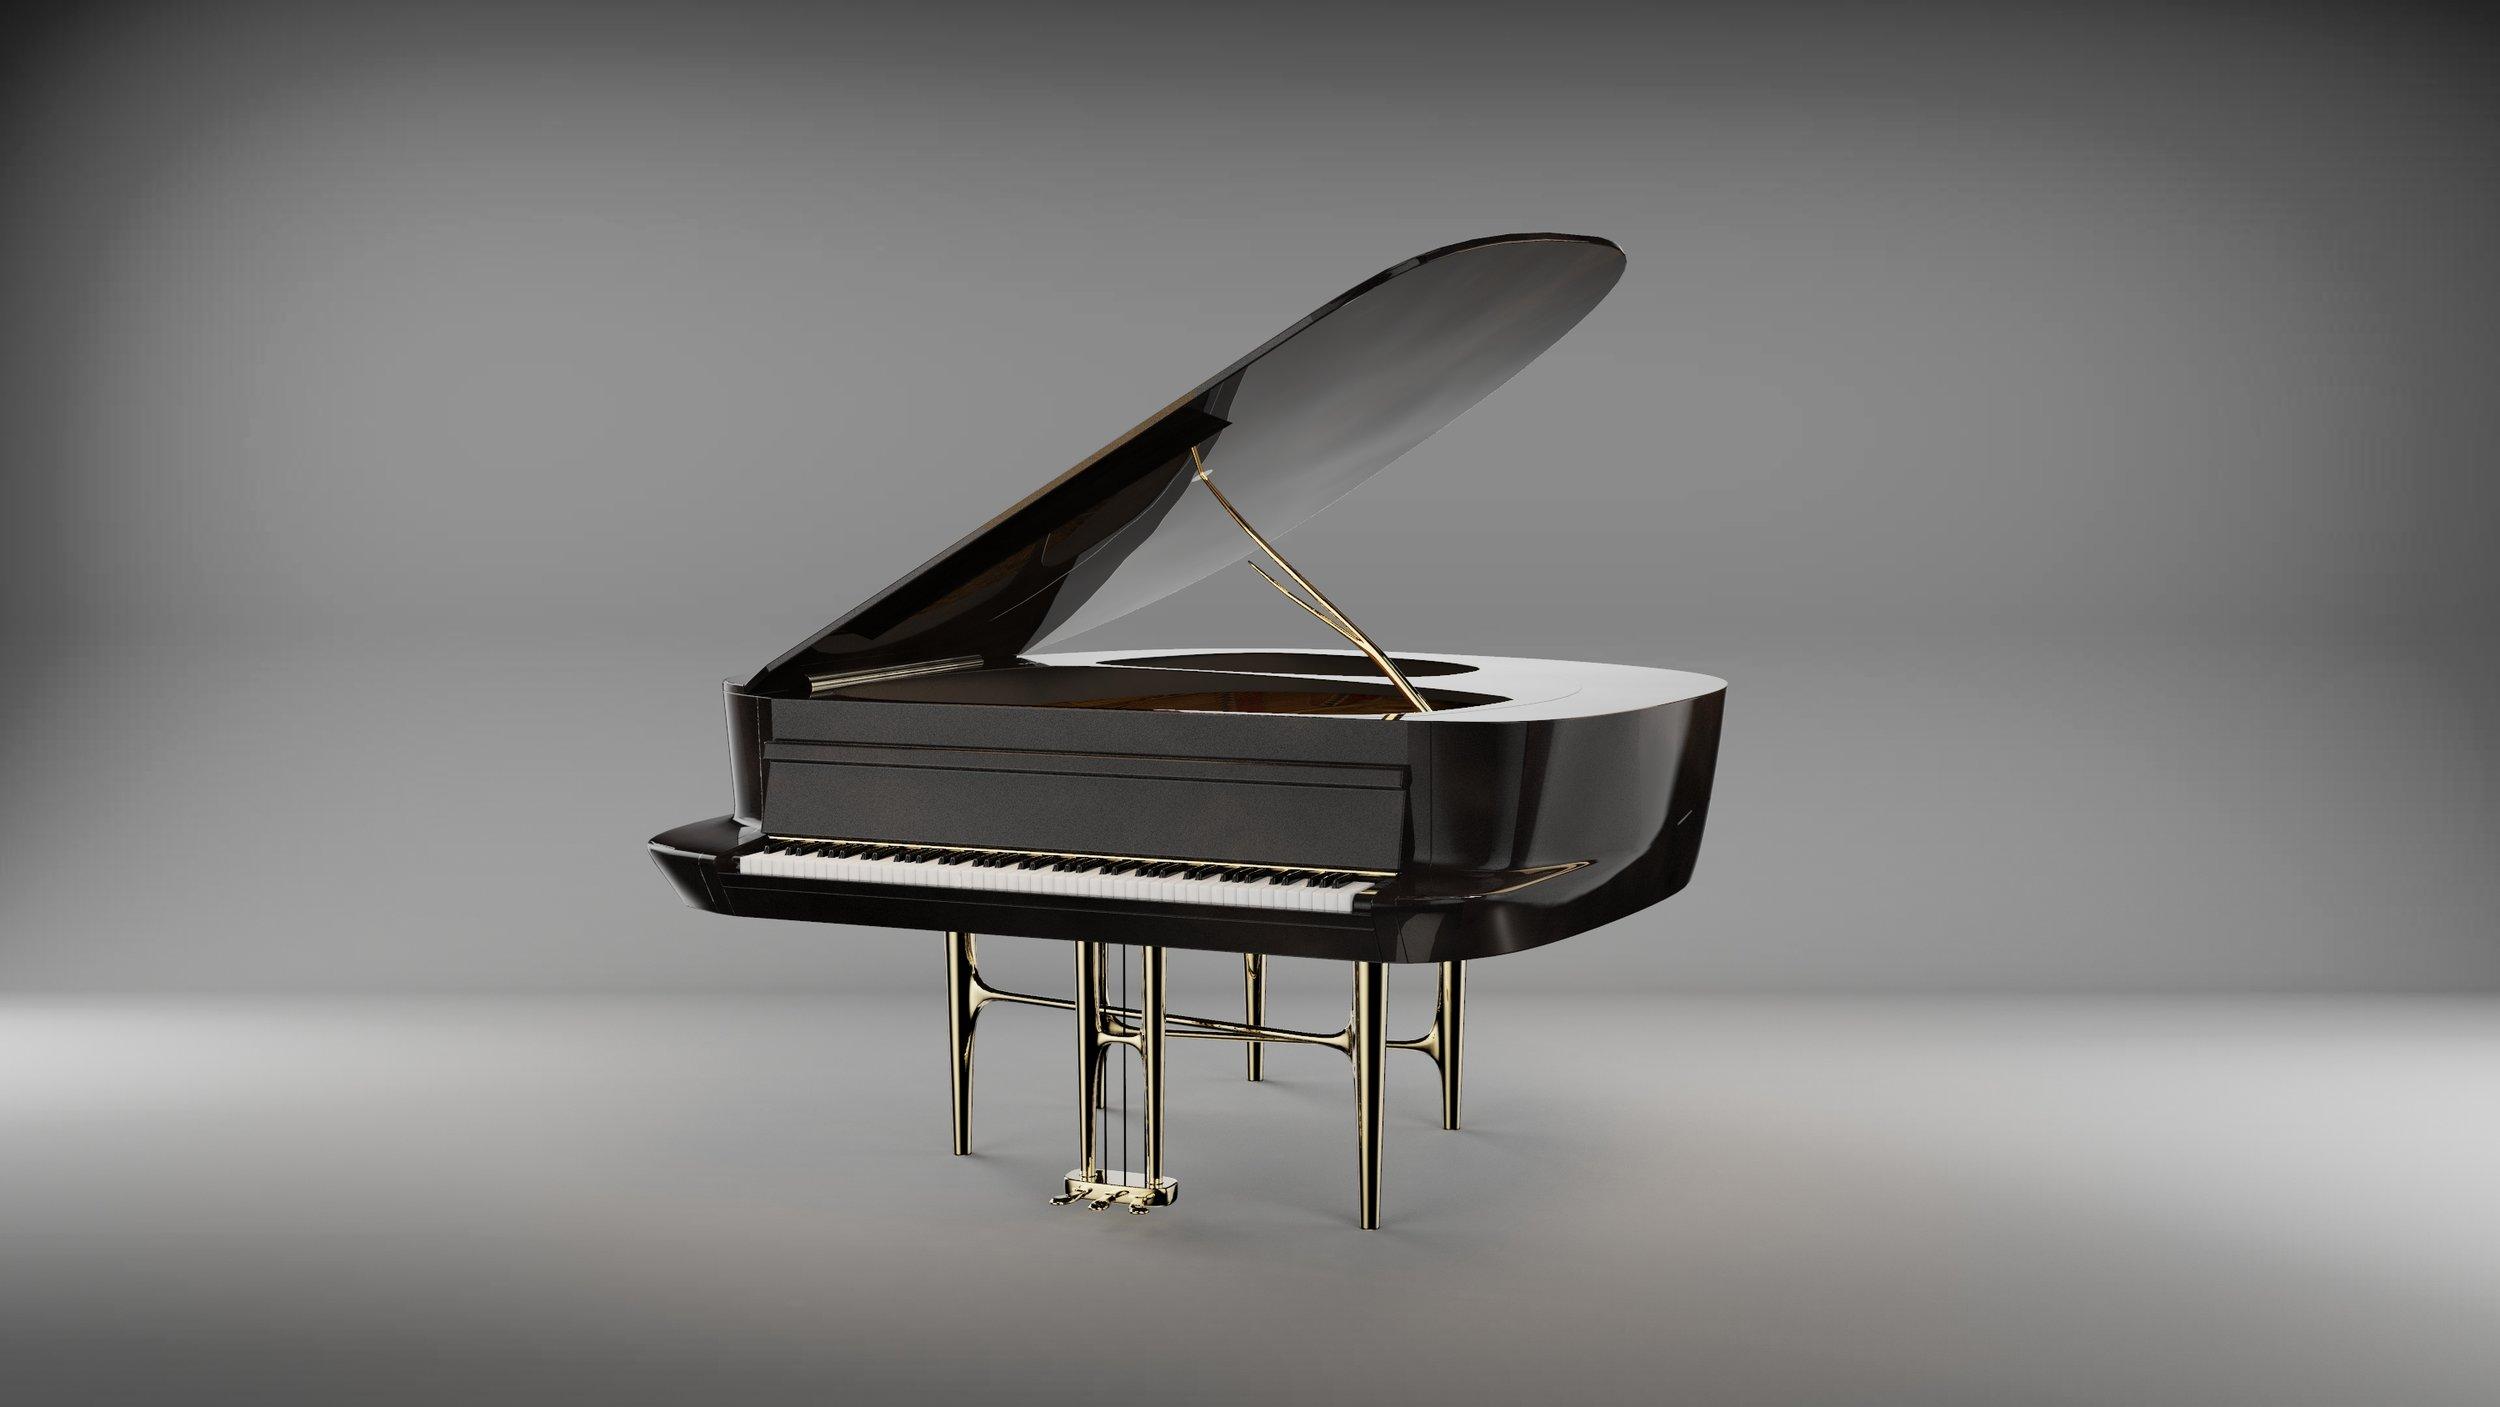 190522_BU_Una_piano_render.2032.jpg